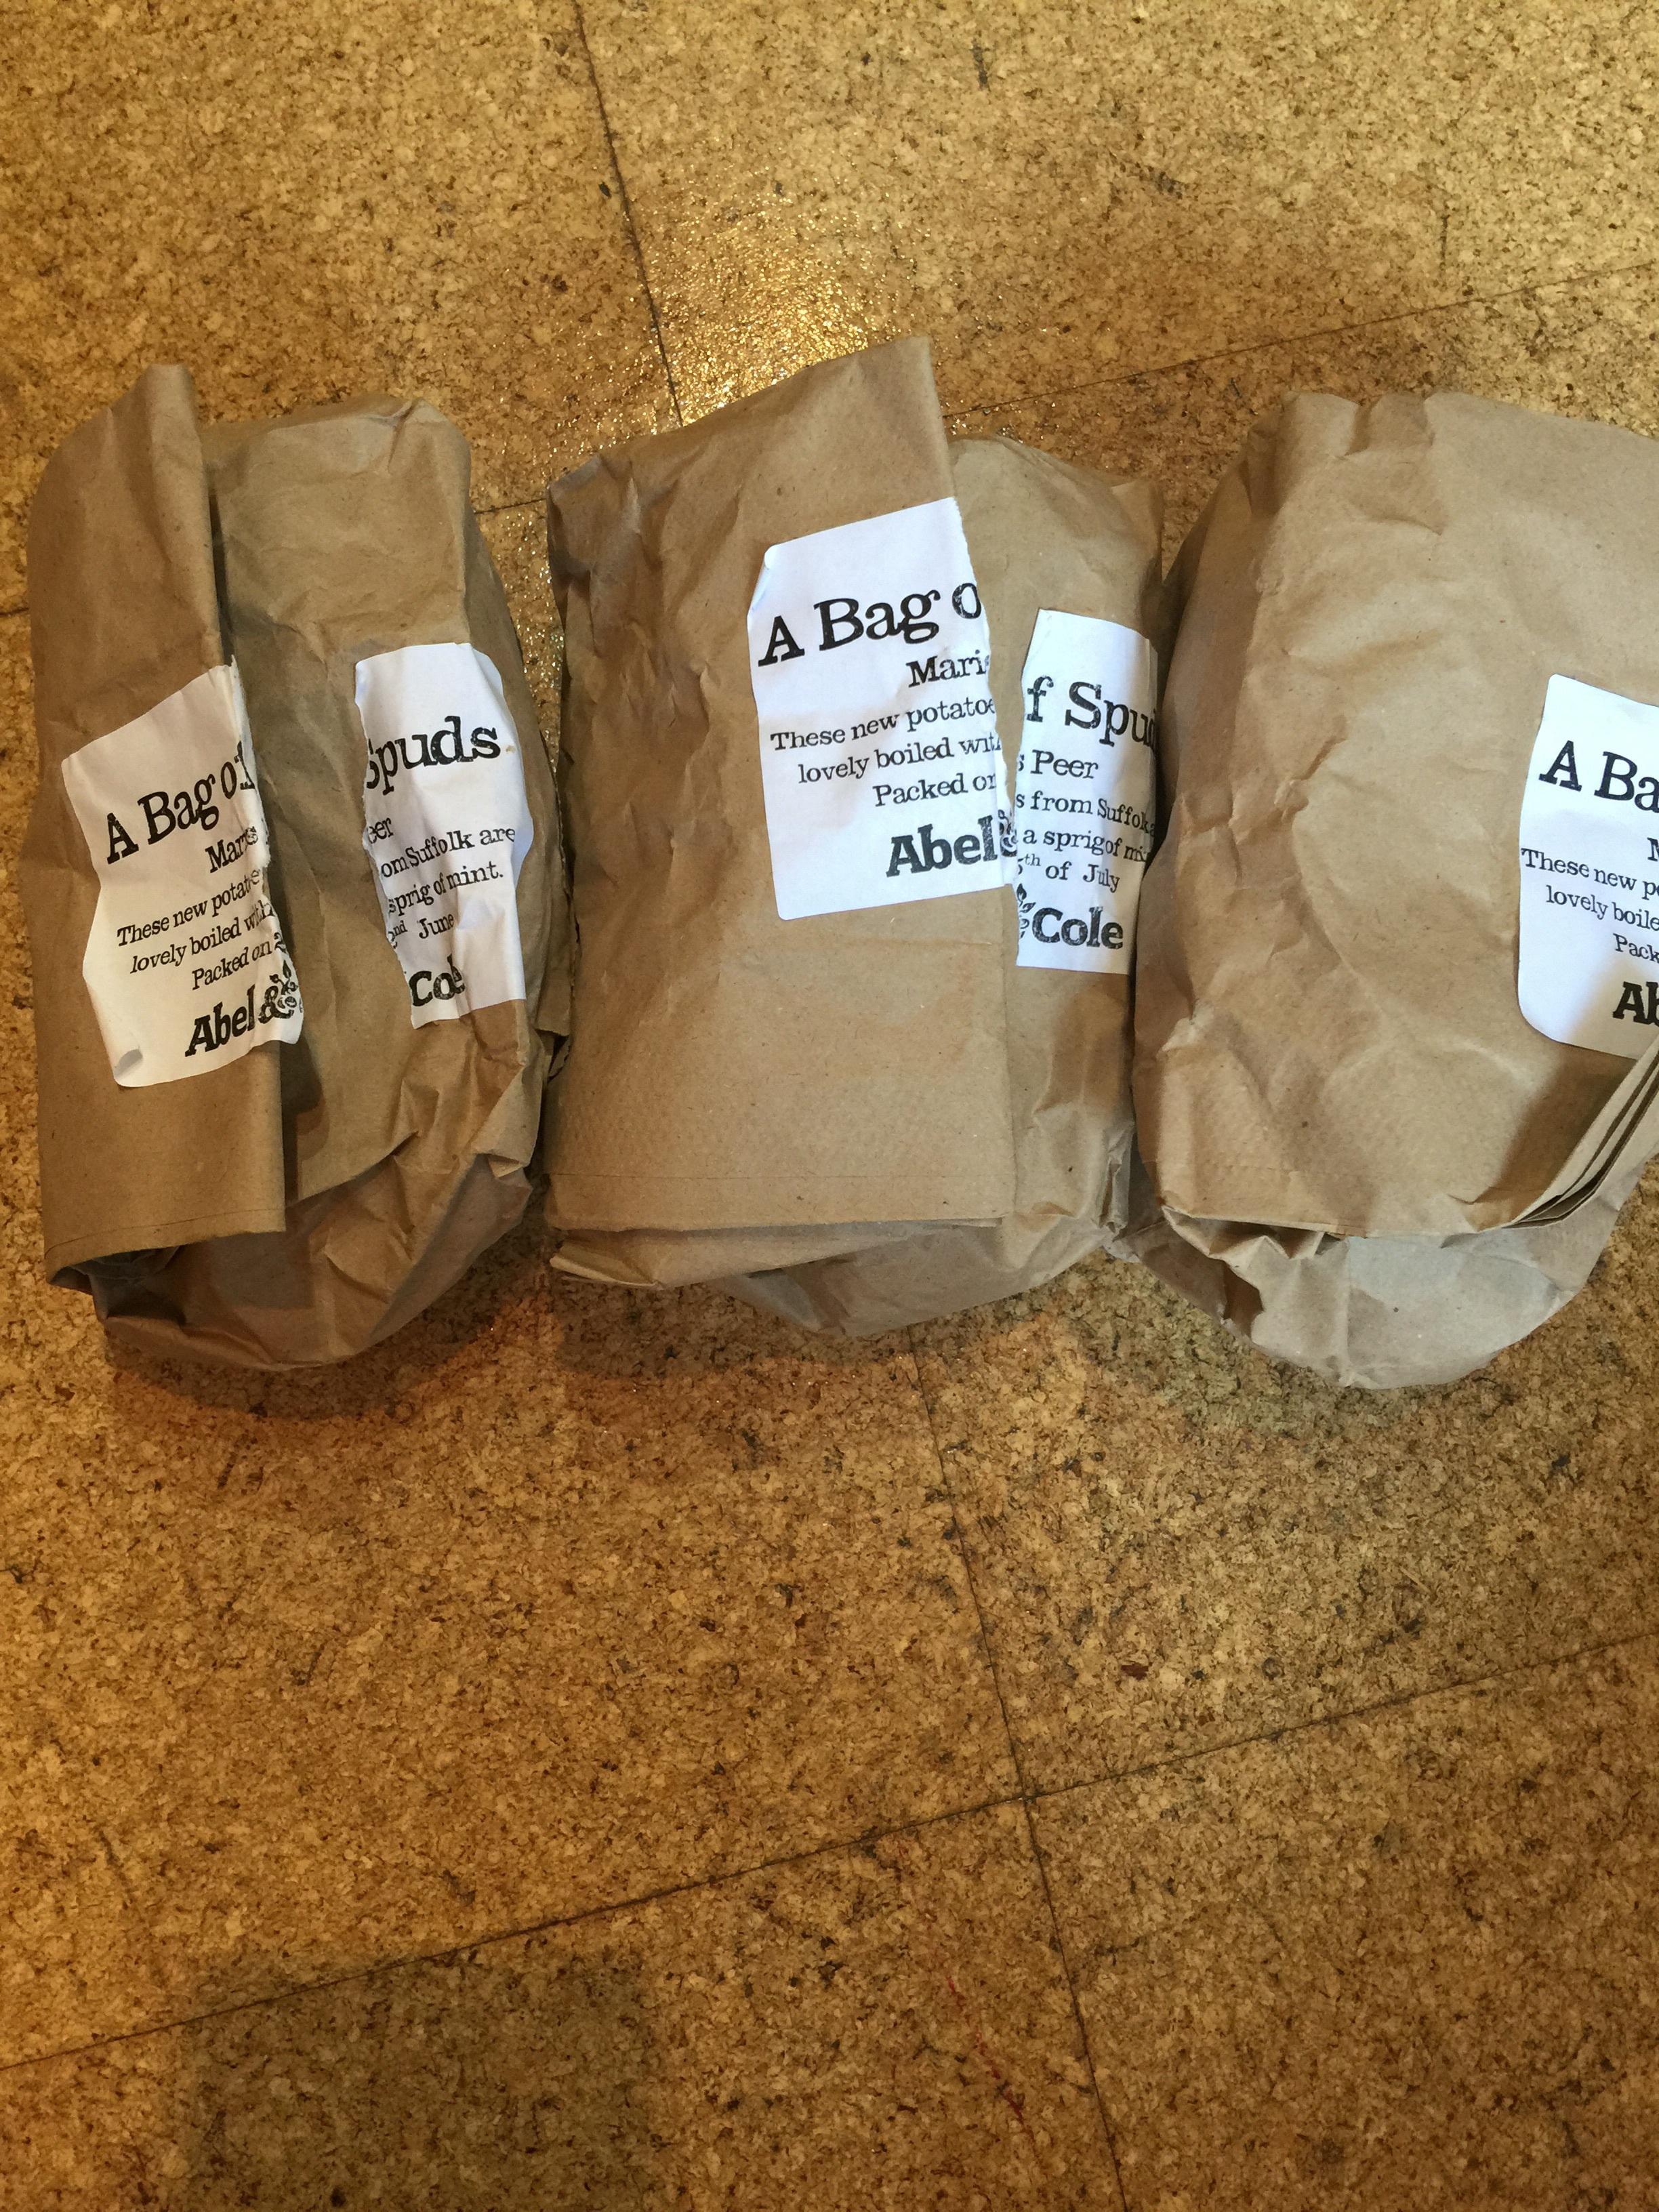 Three bags of organic potatoes